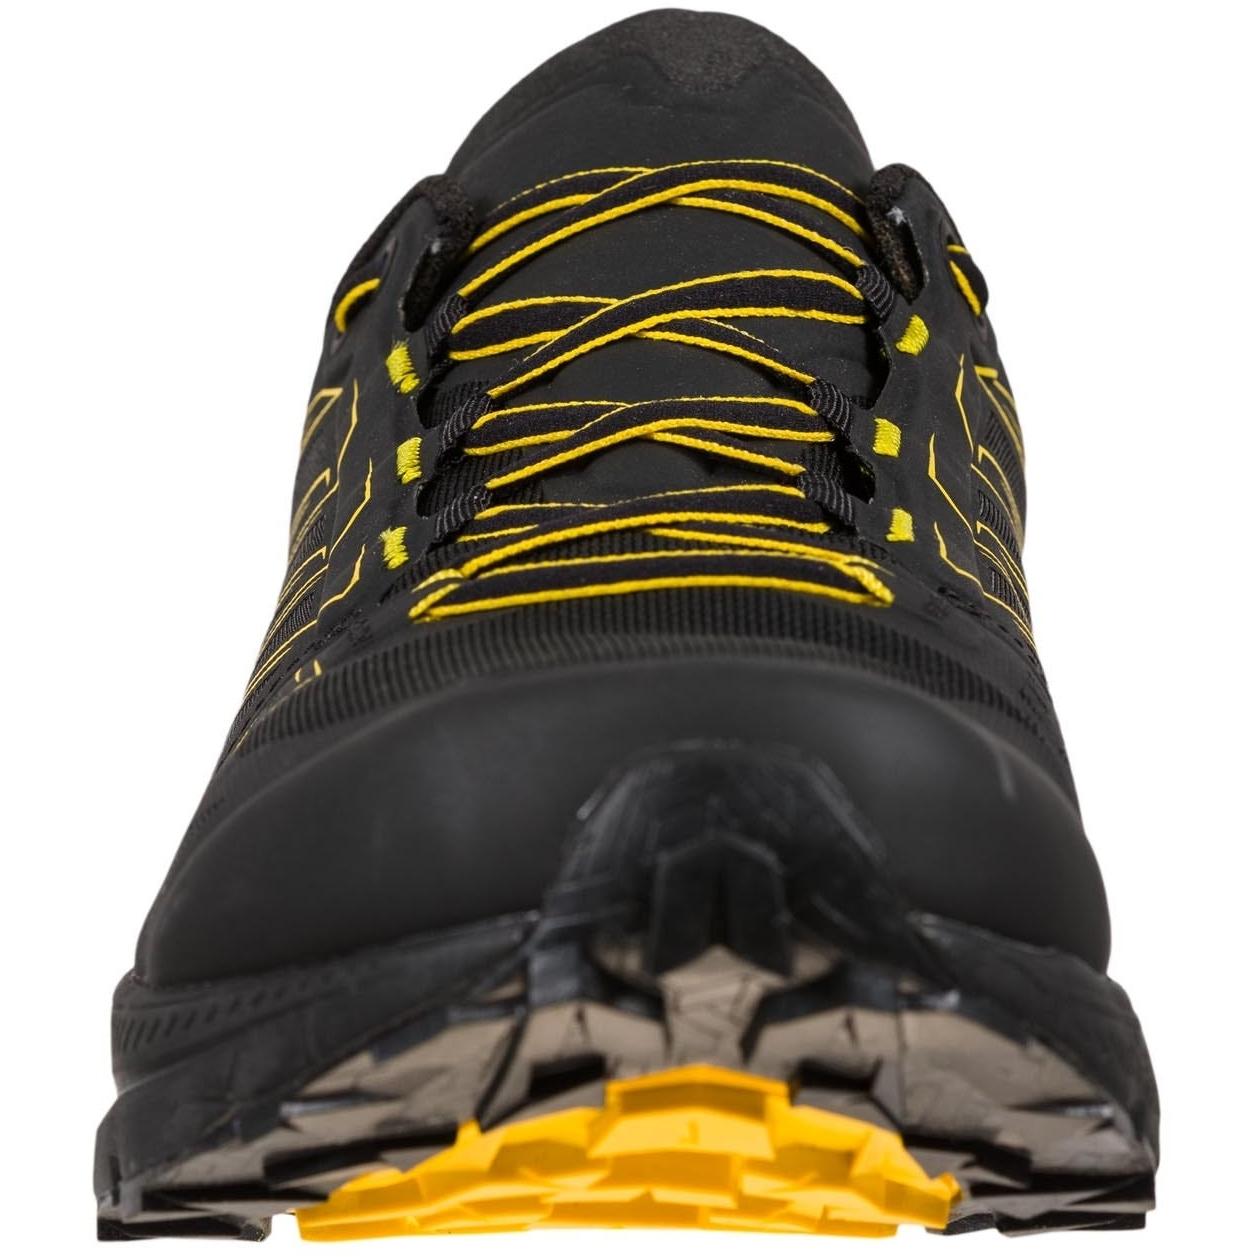 Image of La Sportiva Jackal GTX Running Shoes - Black/Yellow